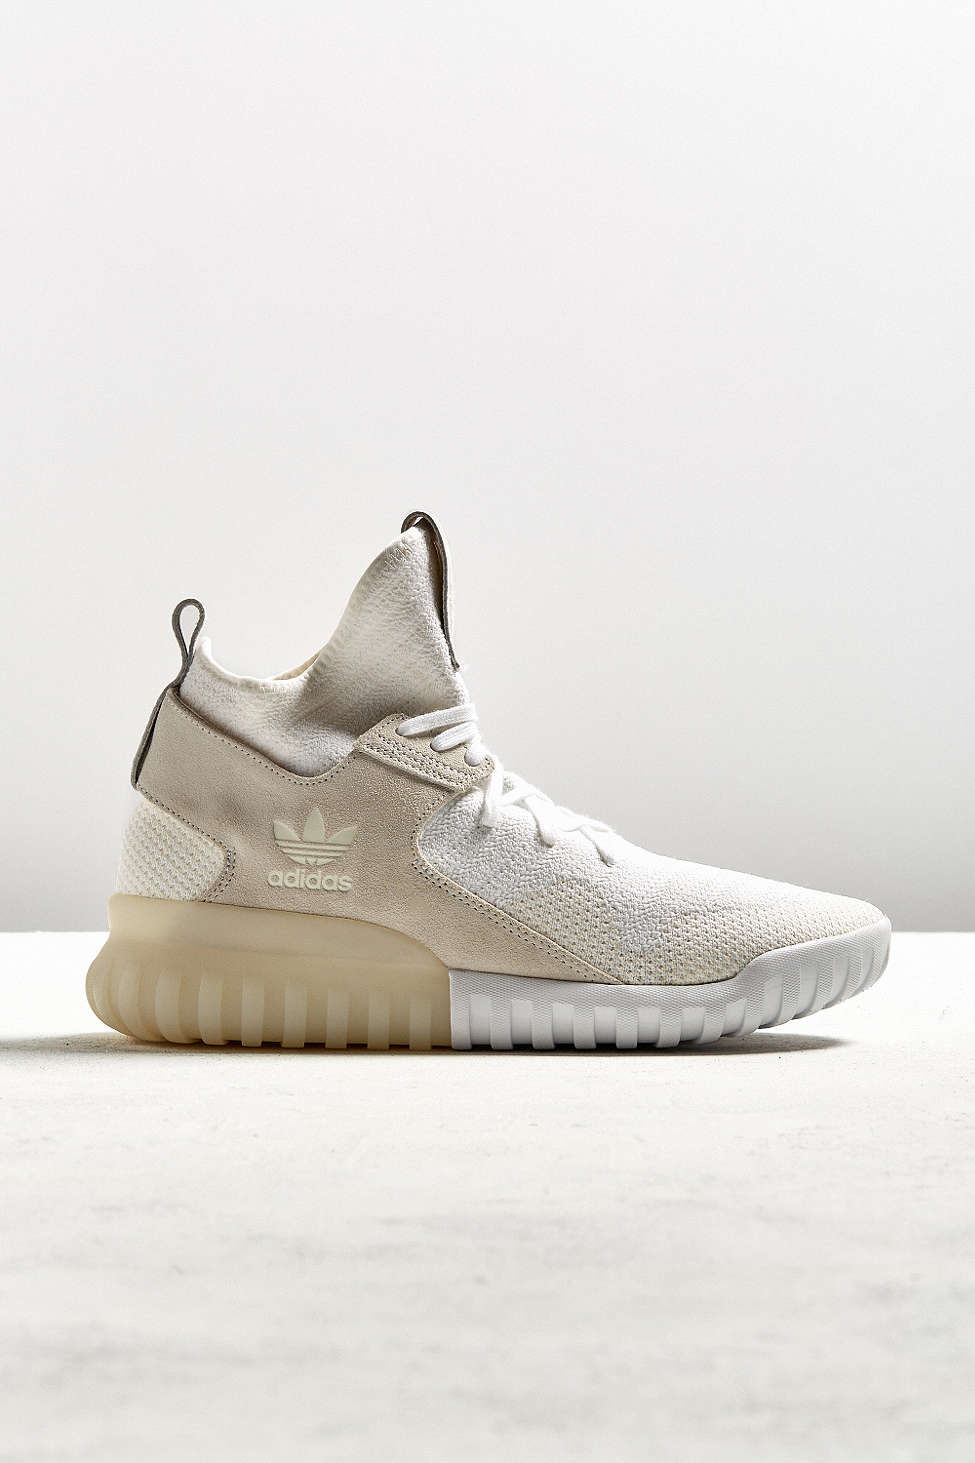 adidas-tubular-x-primeknit-sneaker-1